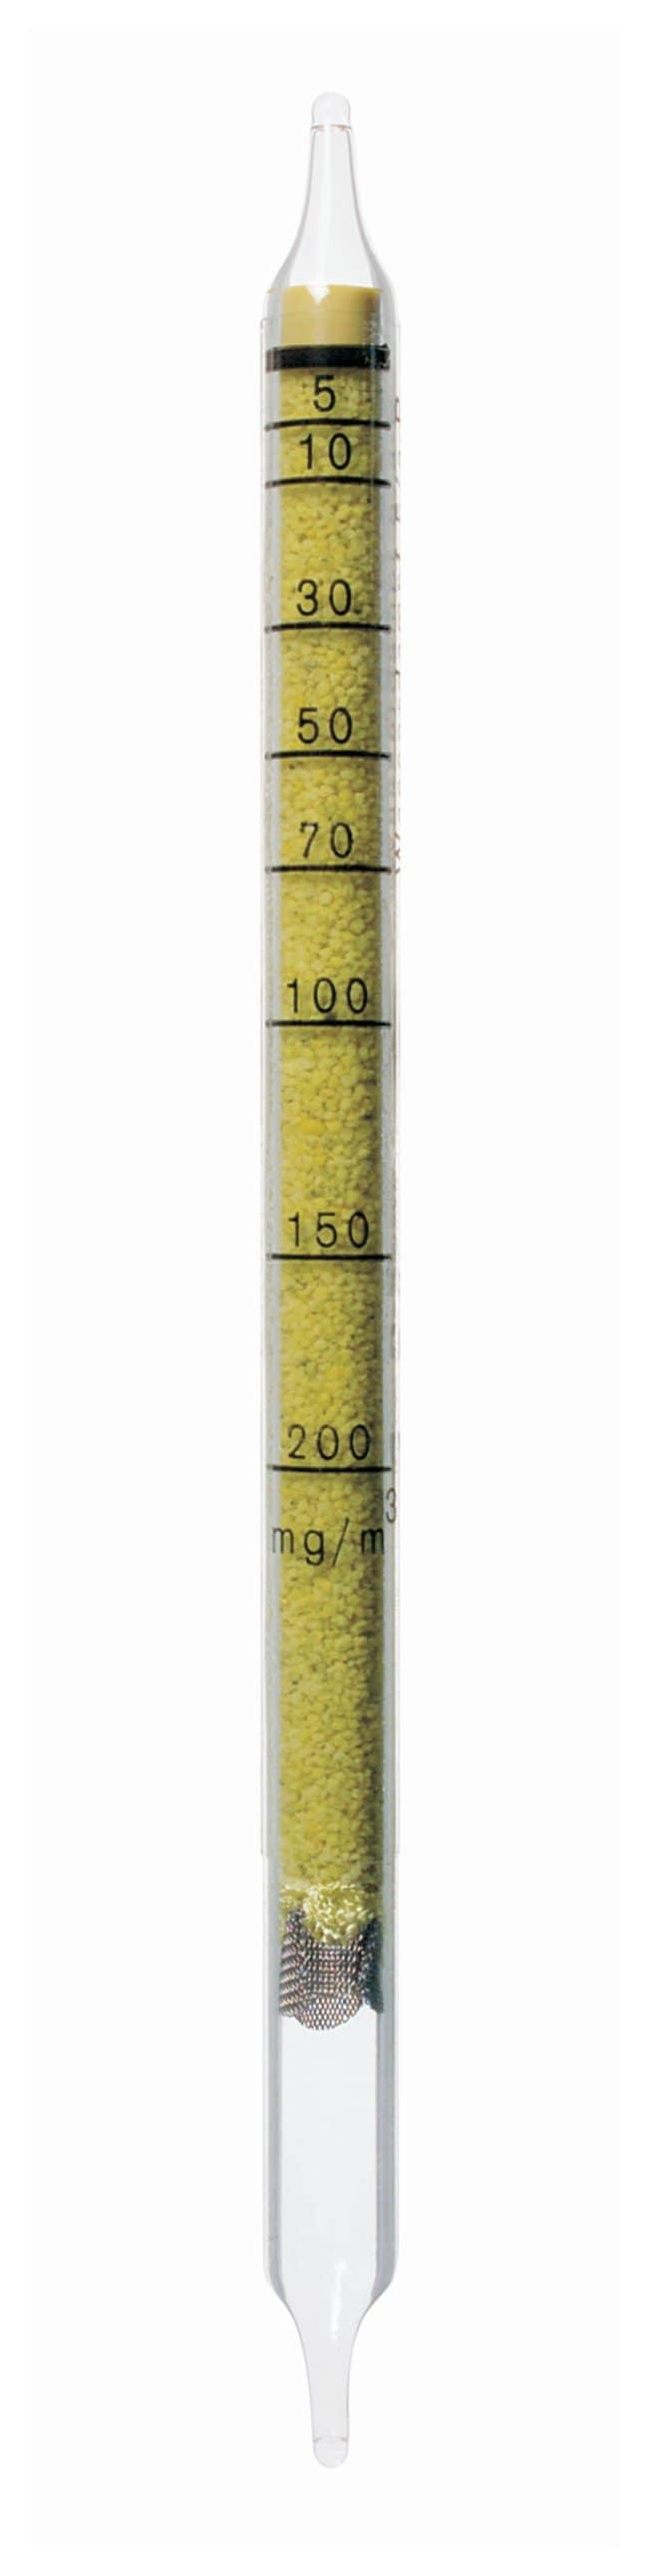 DrgerShort-Term Detector Tubes: Water Vapor Water vapor 0.1; 1-40mg/L:Industrial